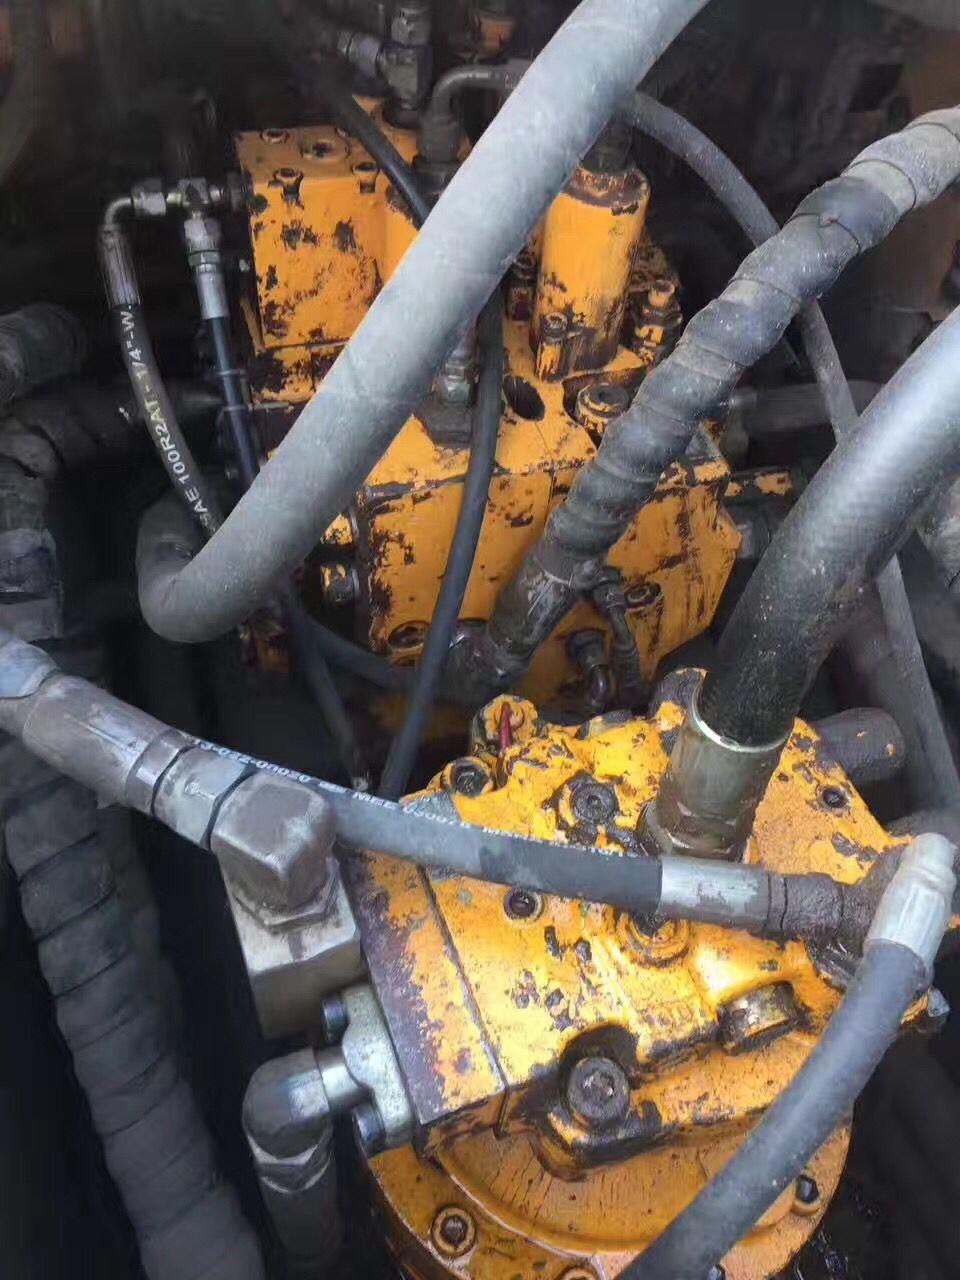 Hot Sale Hyundai Good Working Condition Used Hydraulic Crawler Excavator Hyundai R225-7 (construction equipment2011)